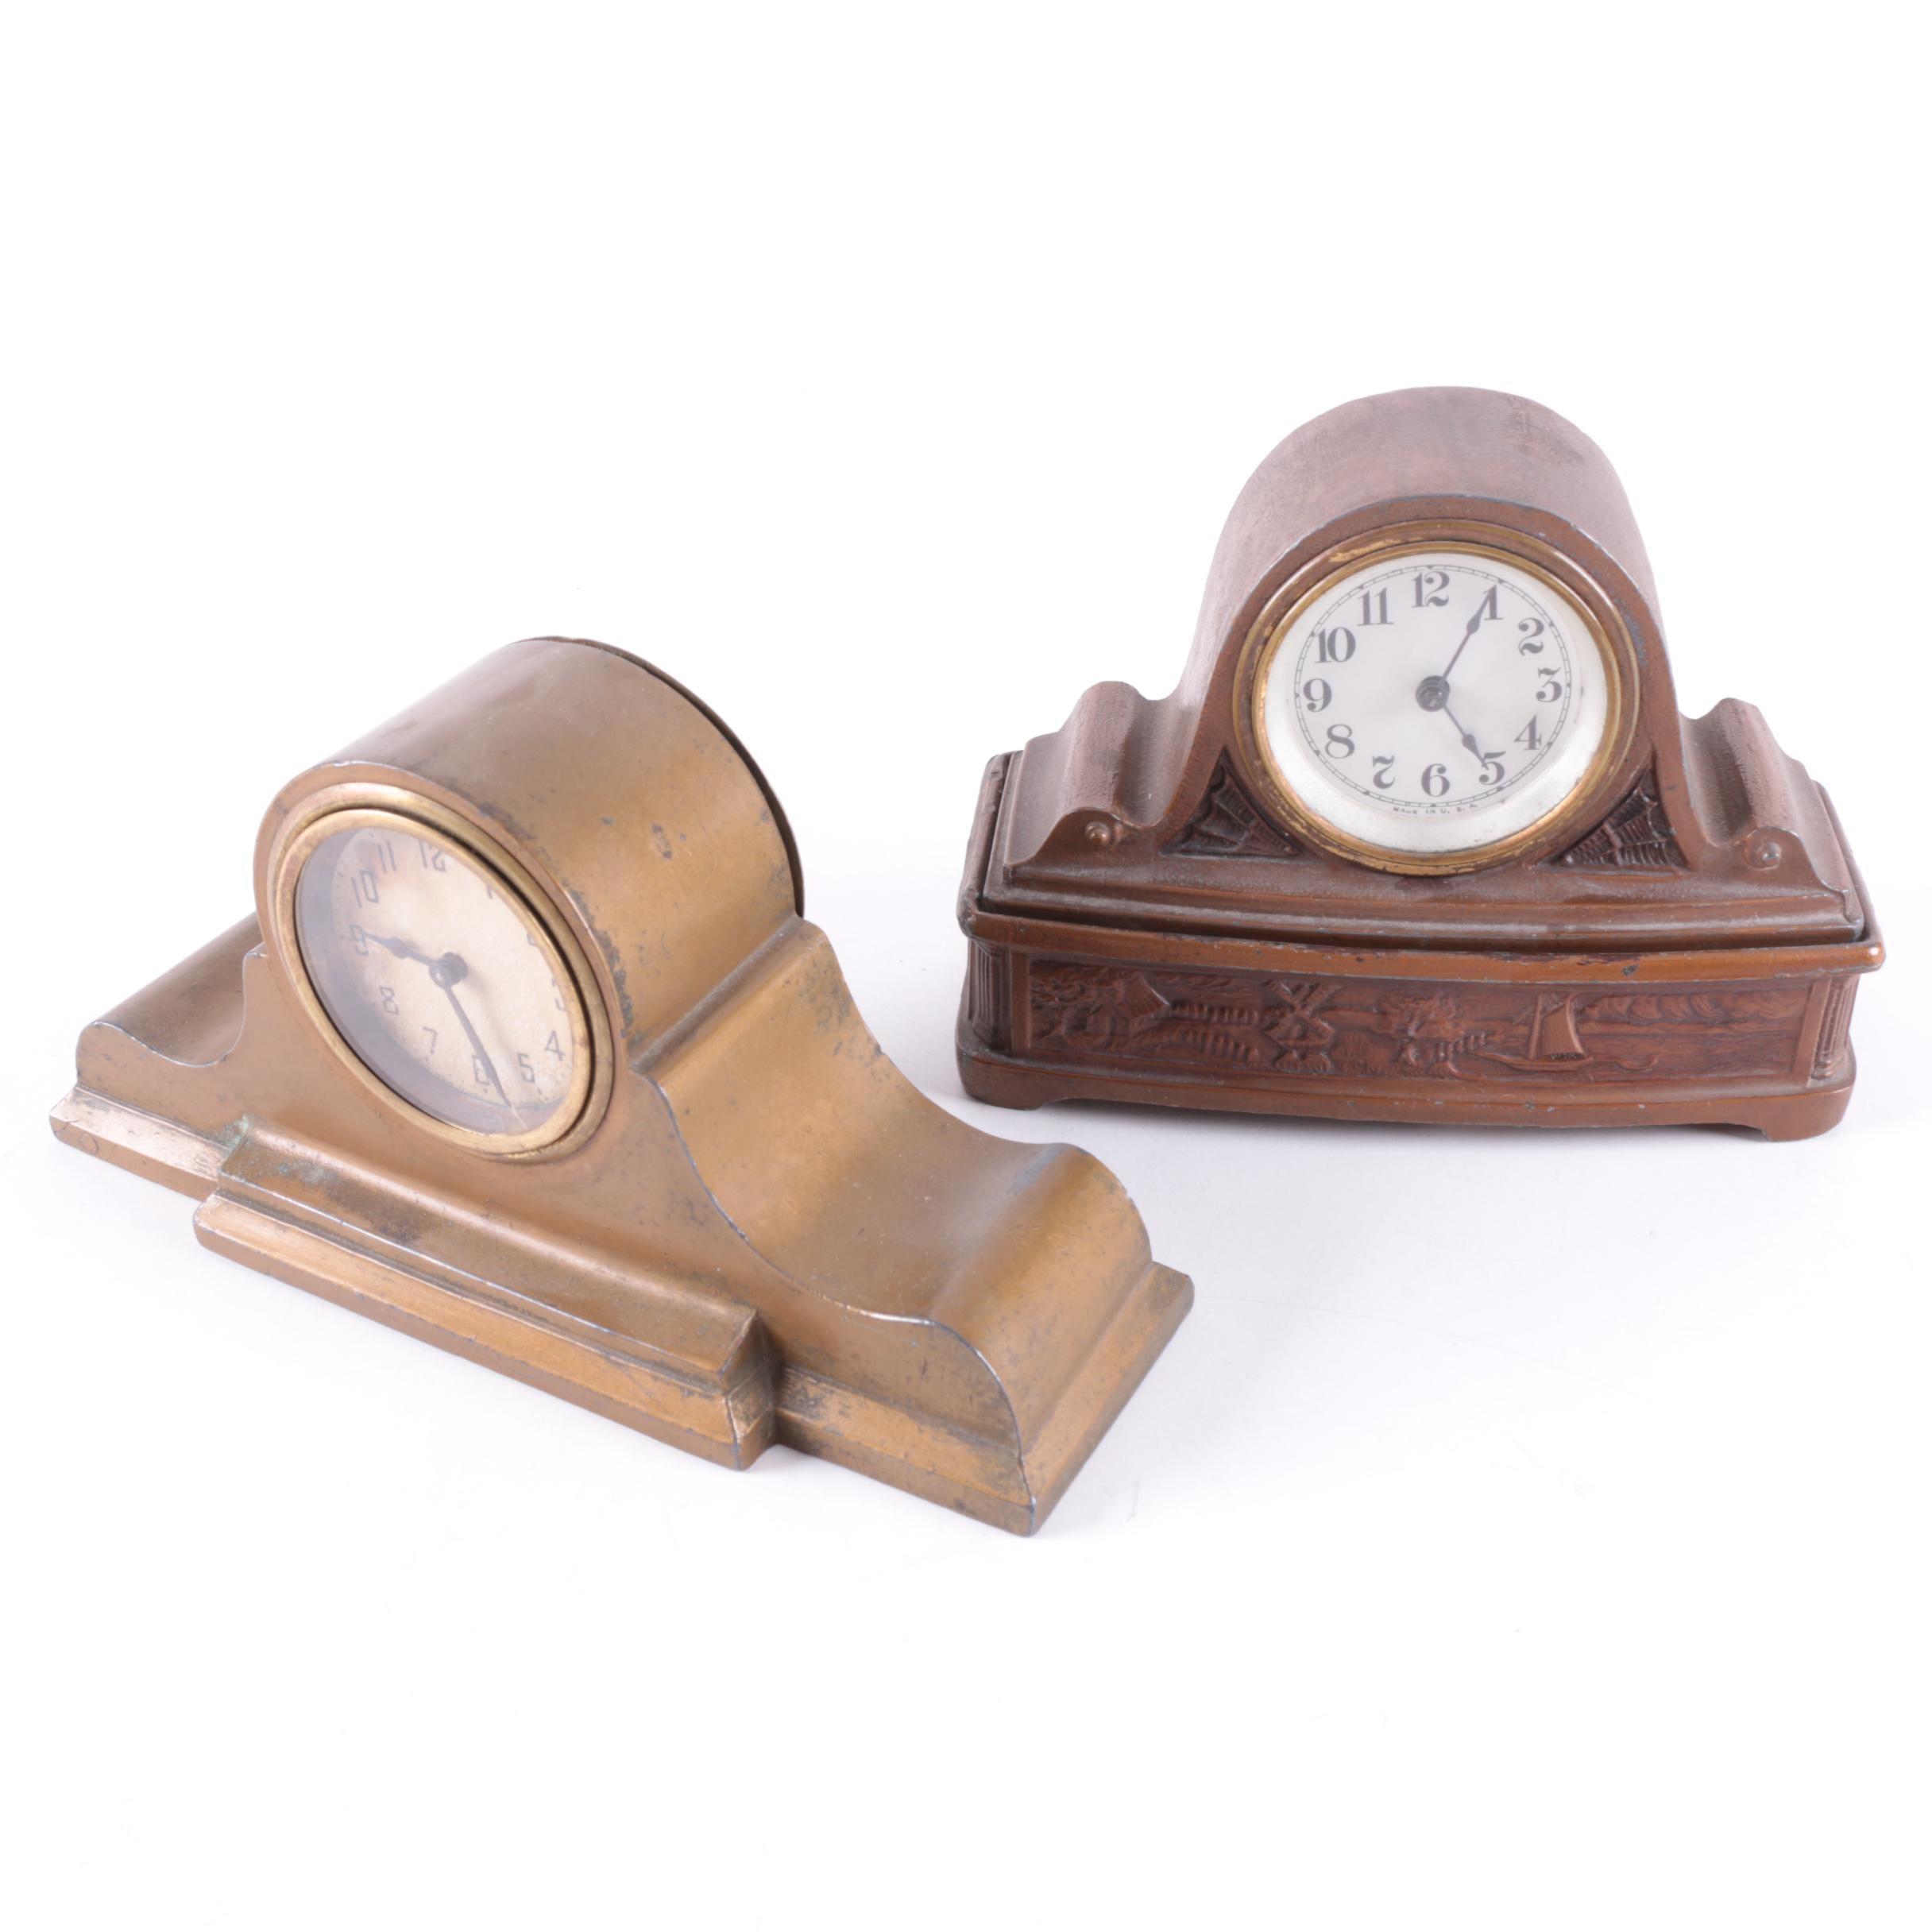 Vintage Cast Metal Tambour Style Mantel Clocks including New Haven